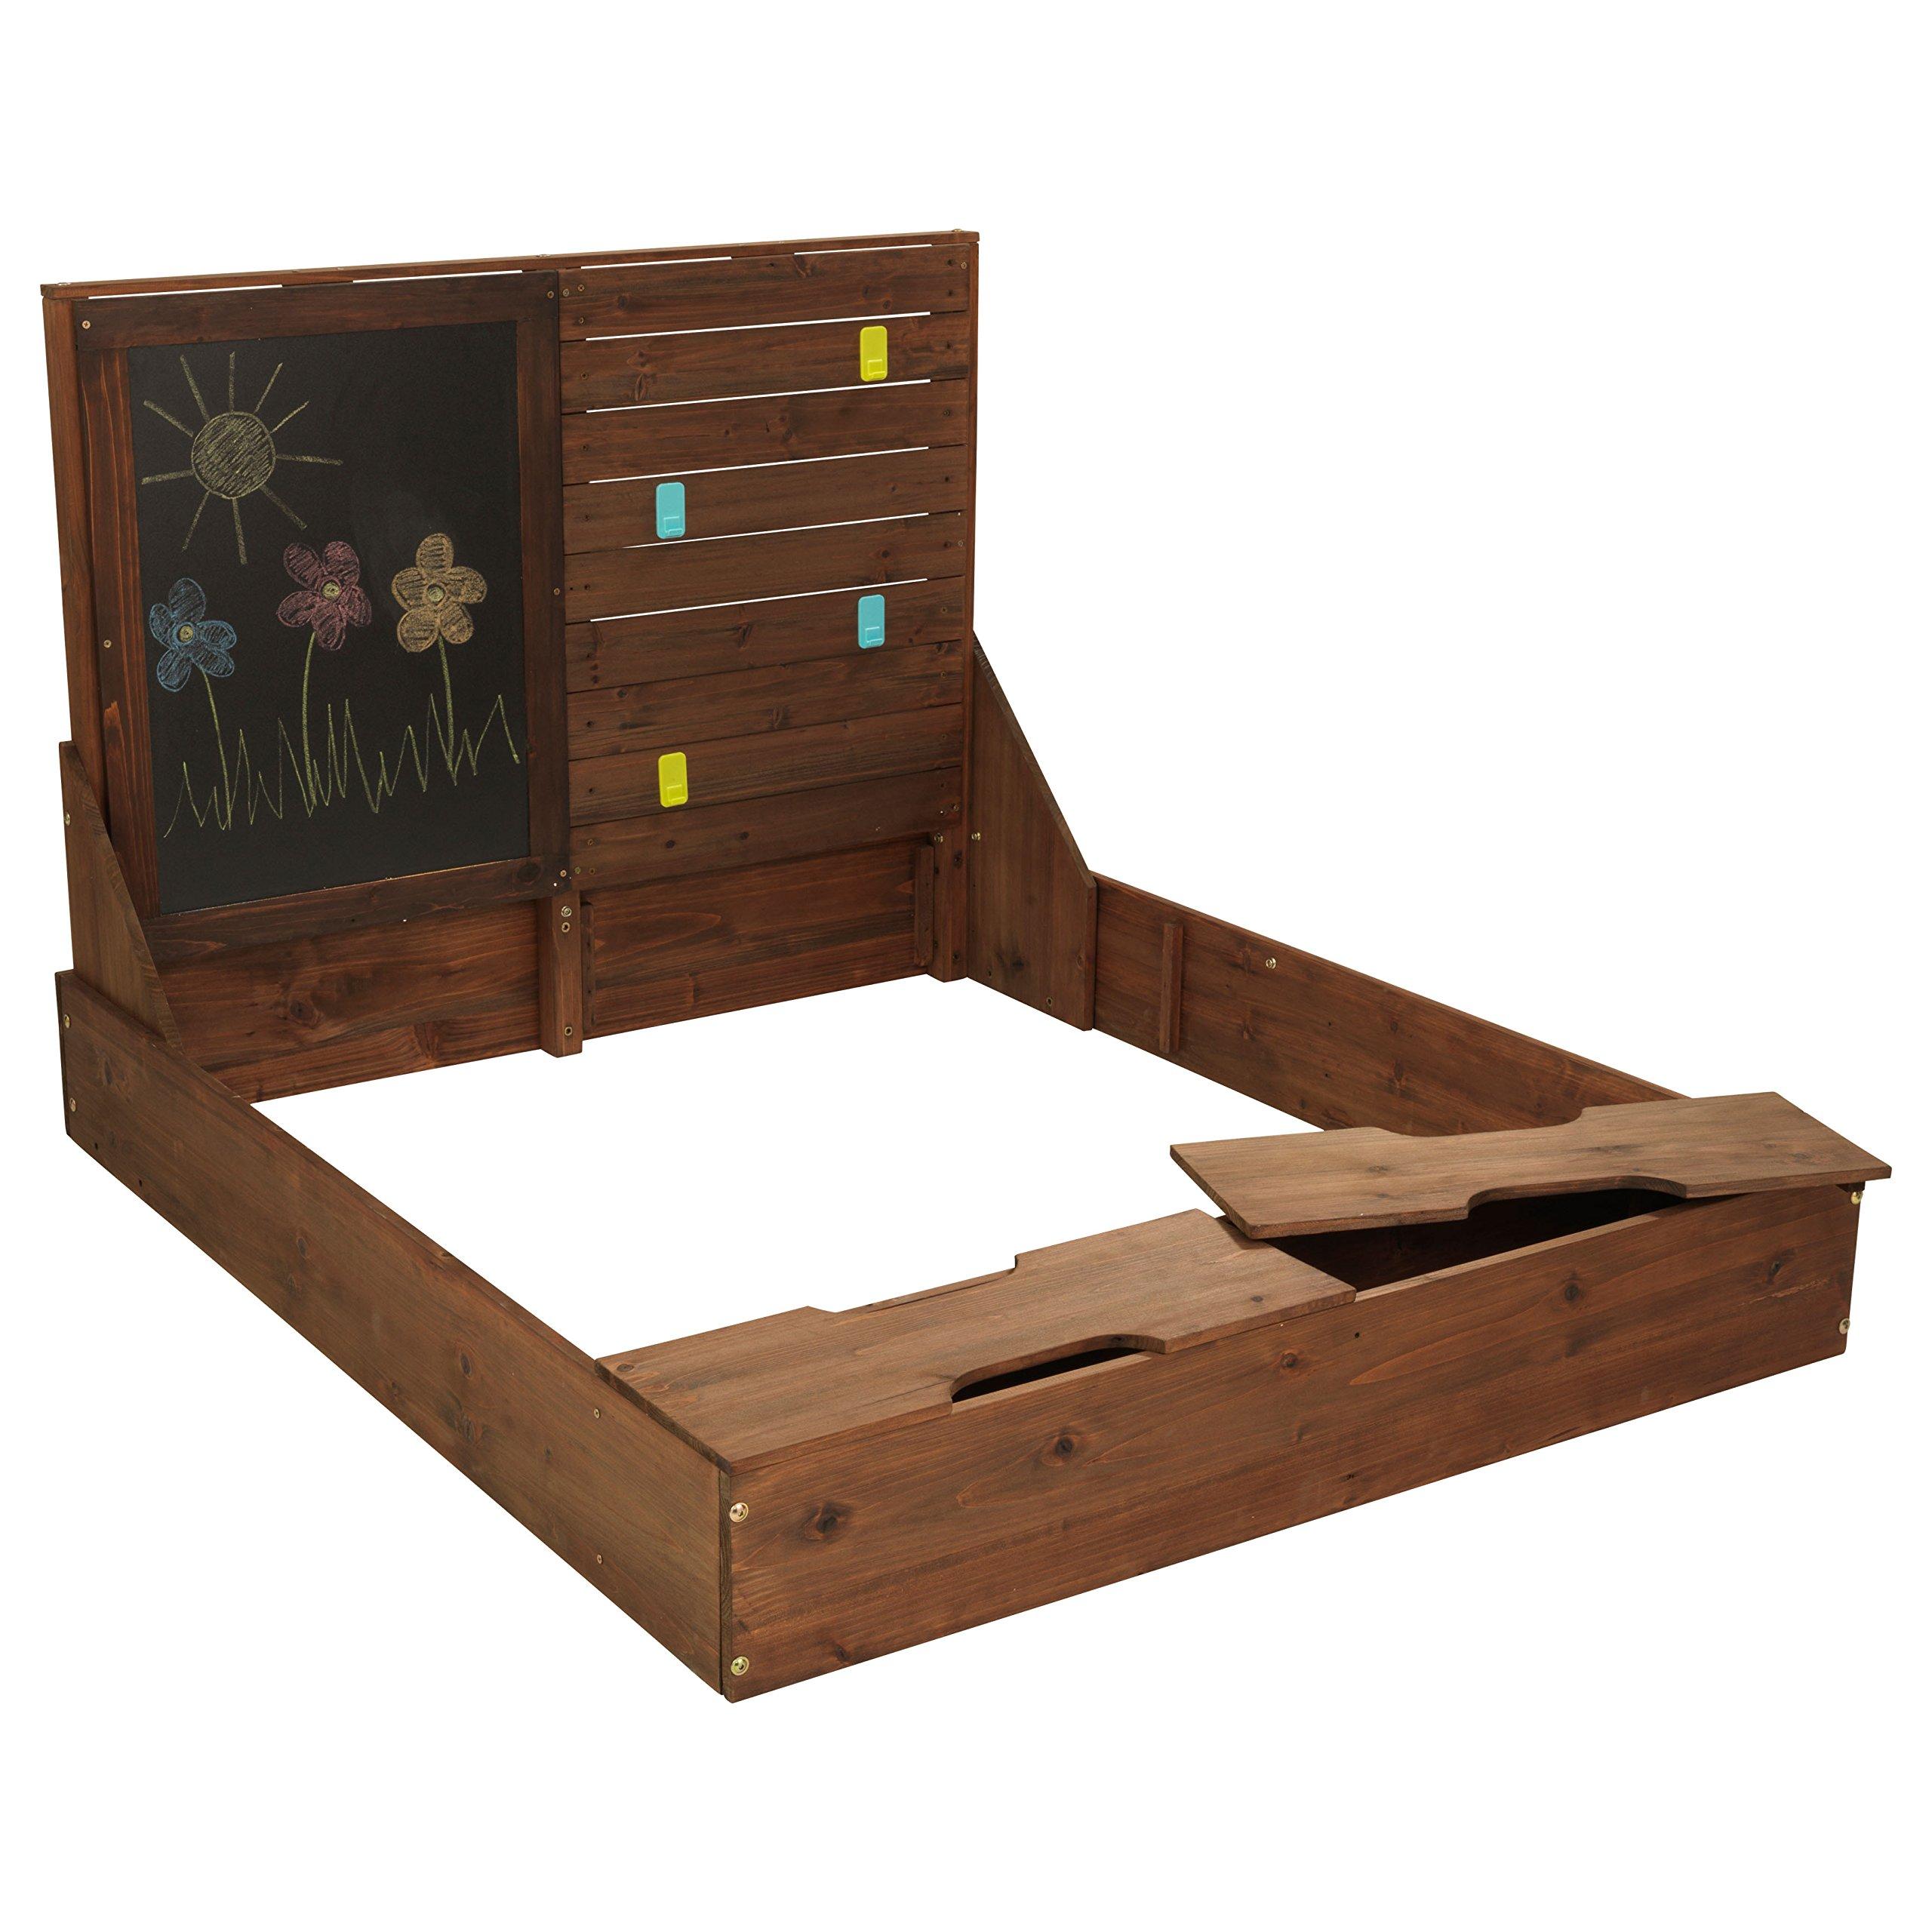 KidKraft 00517 Activity Sandbox Toy